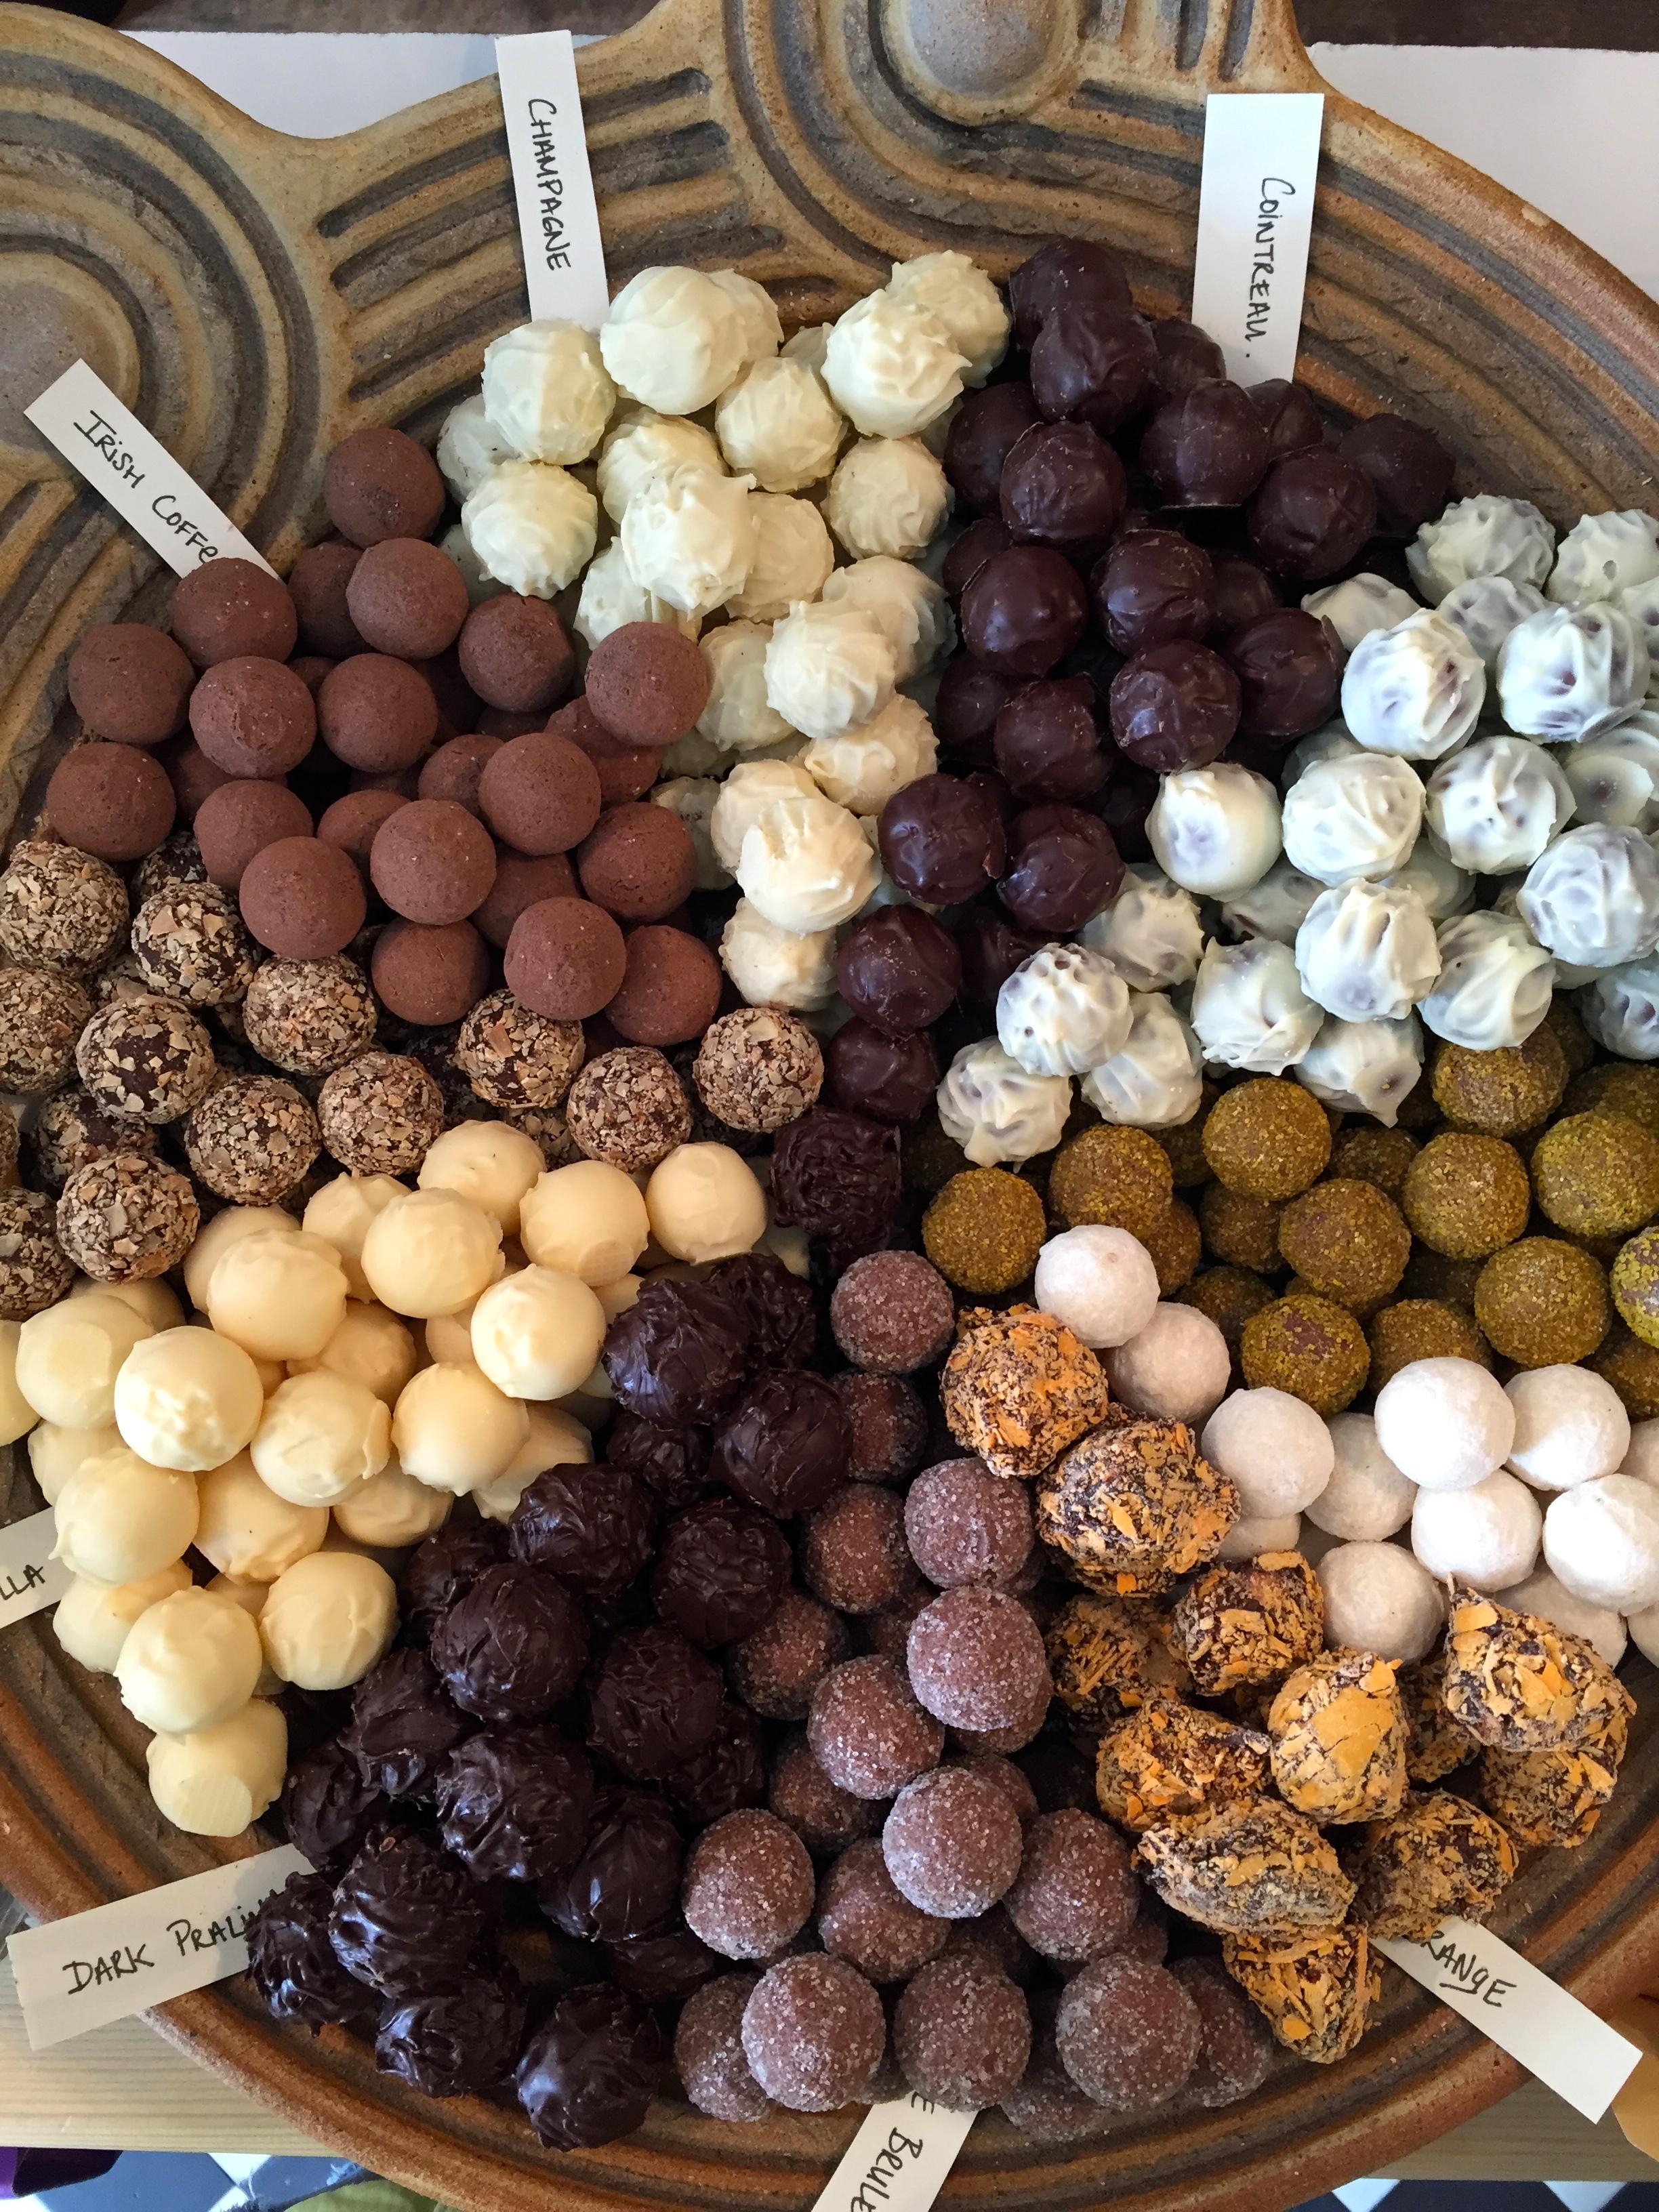 Death by chocolate truffles. Dingle, Co. Kerry, Ireland.